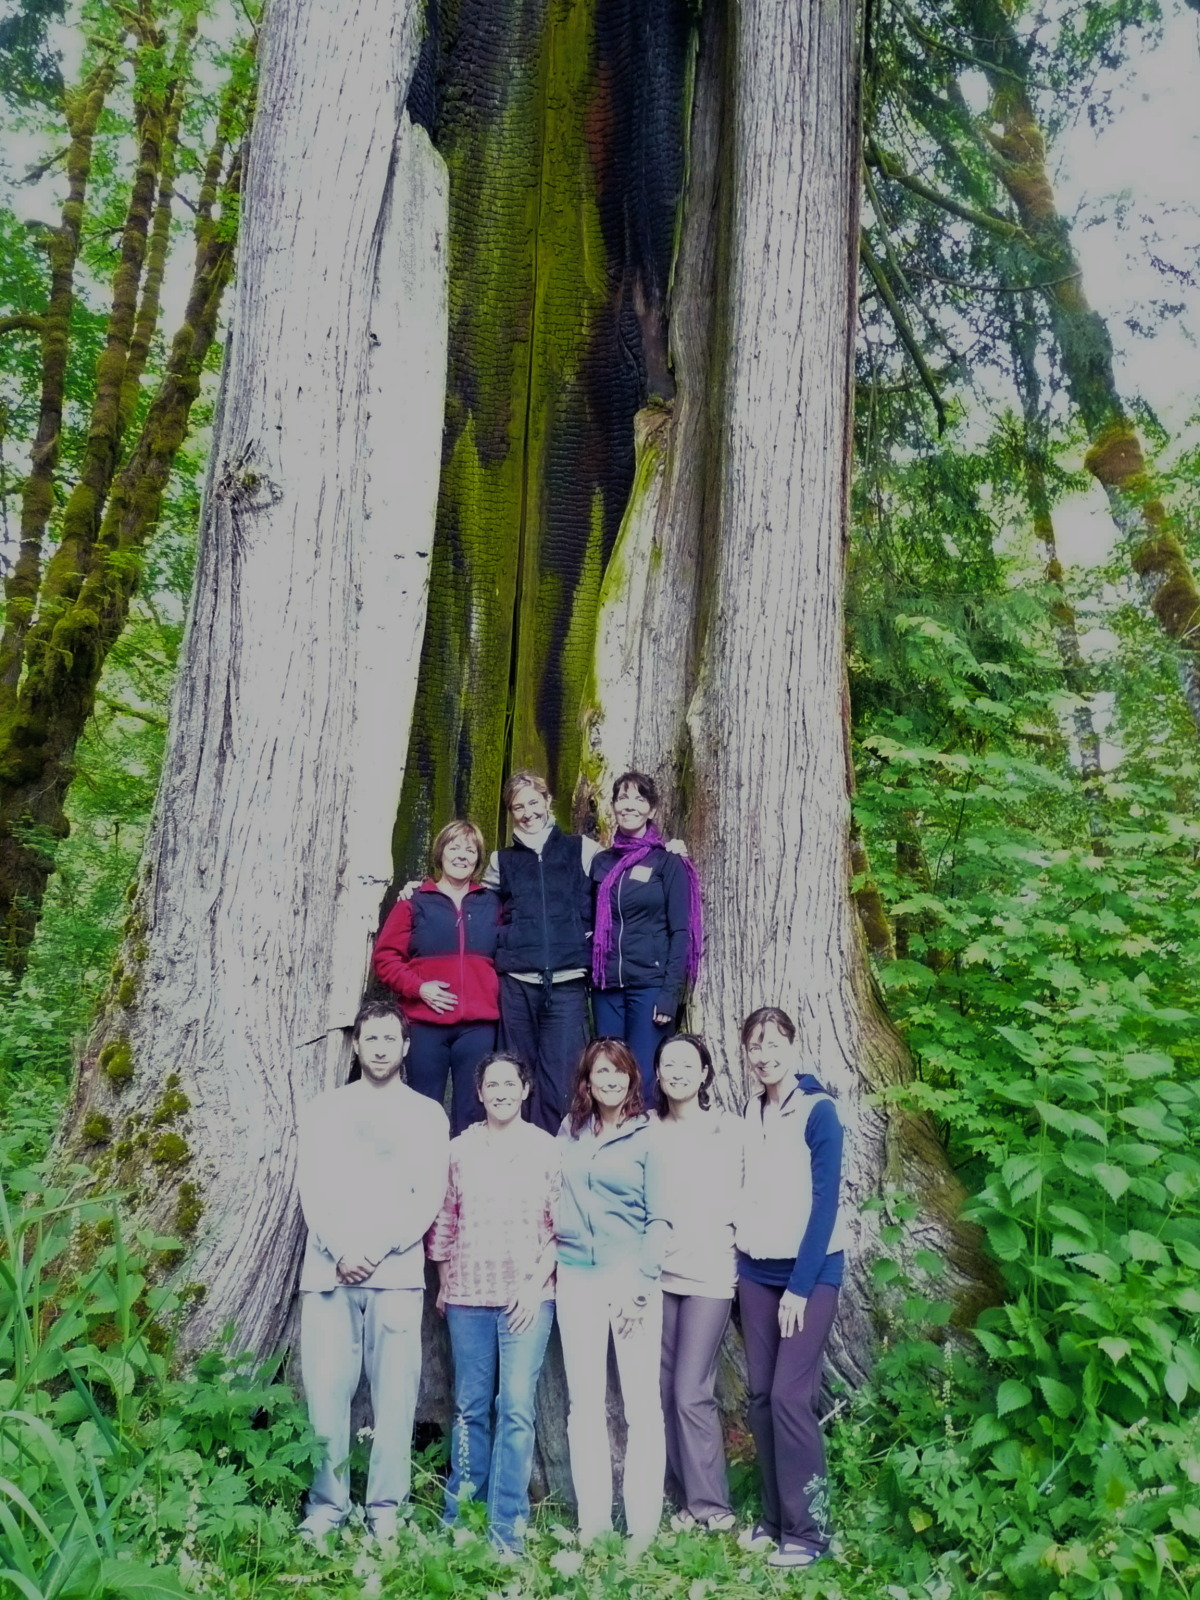 Standing in the Cedar Tree